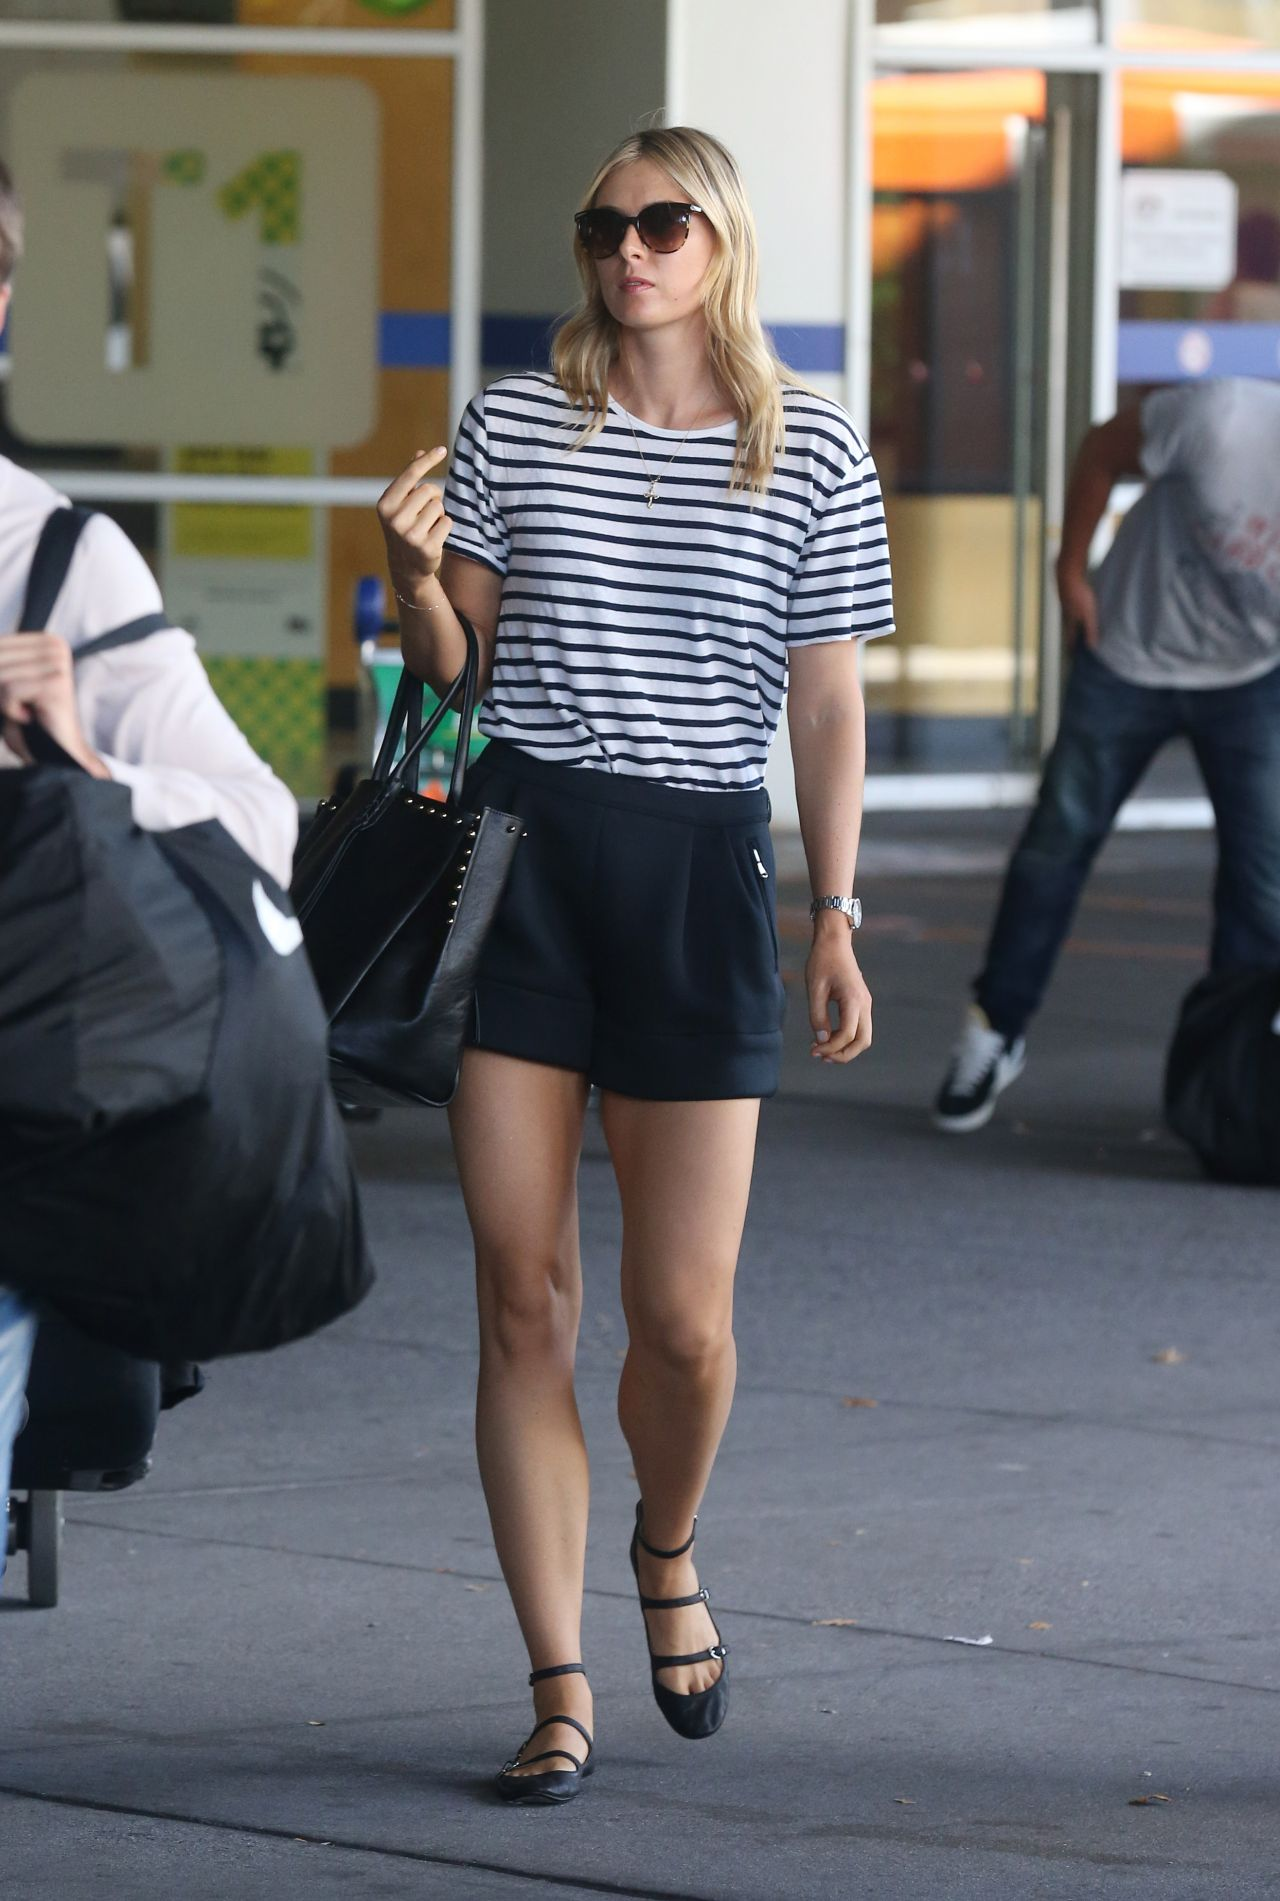 Maria Sharapova Leggy in Mini Skirt - Arrives at Melbourne Airport - January 2015